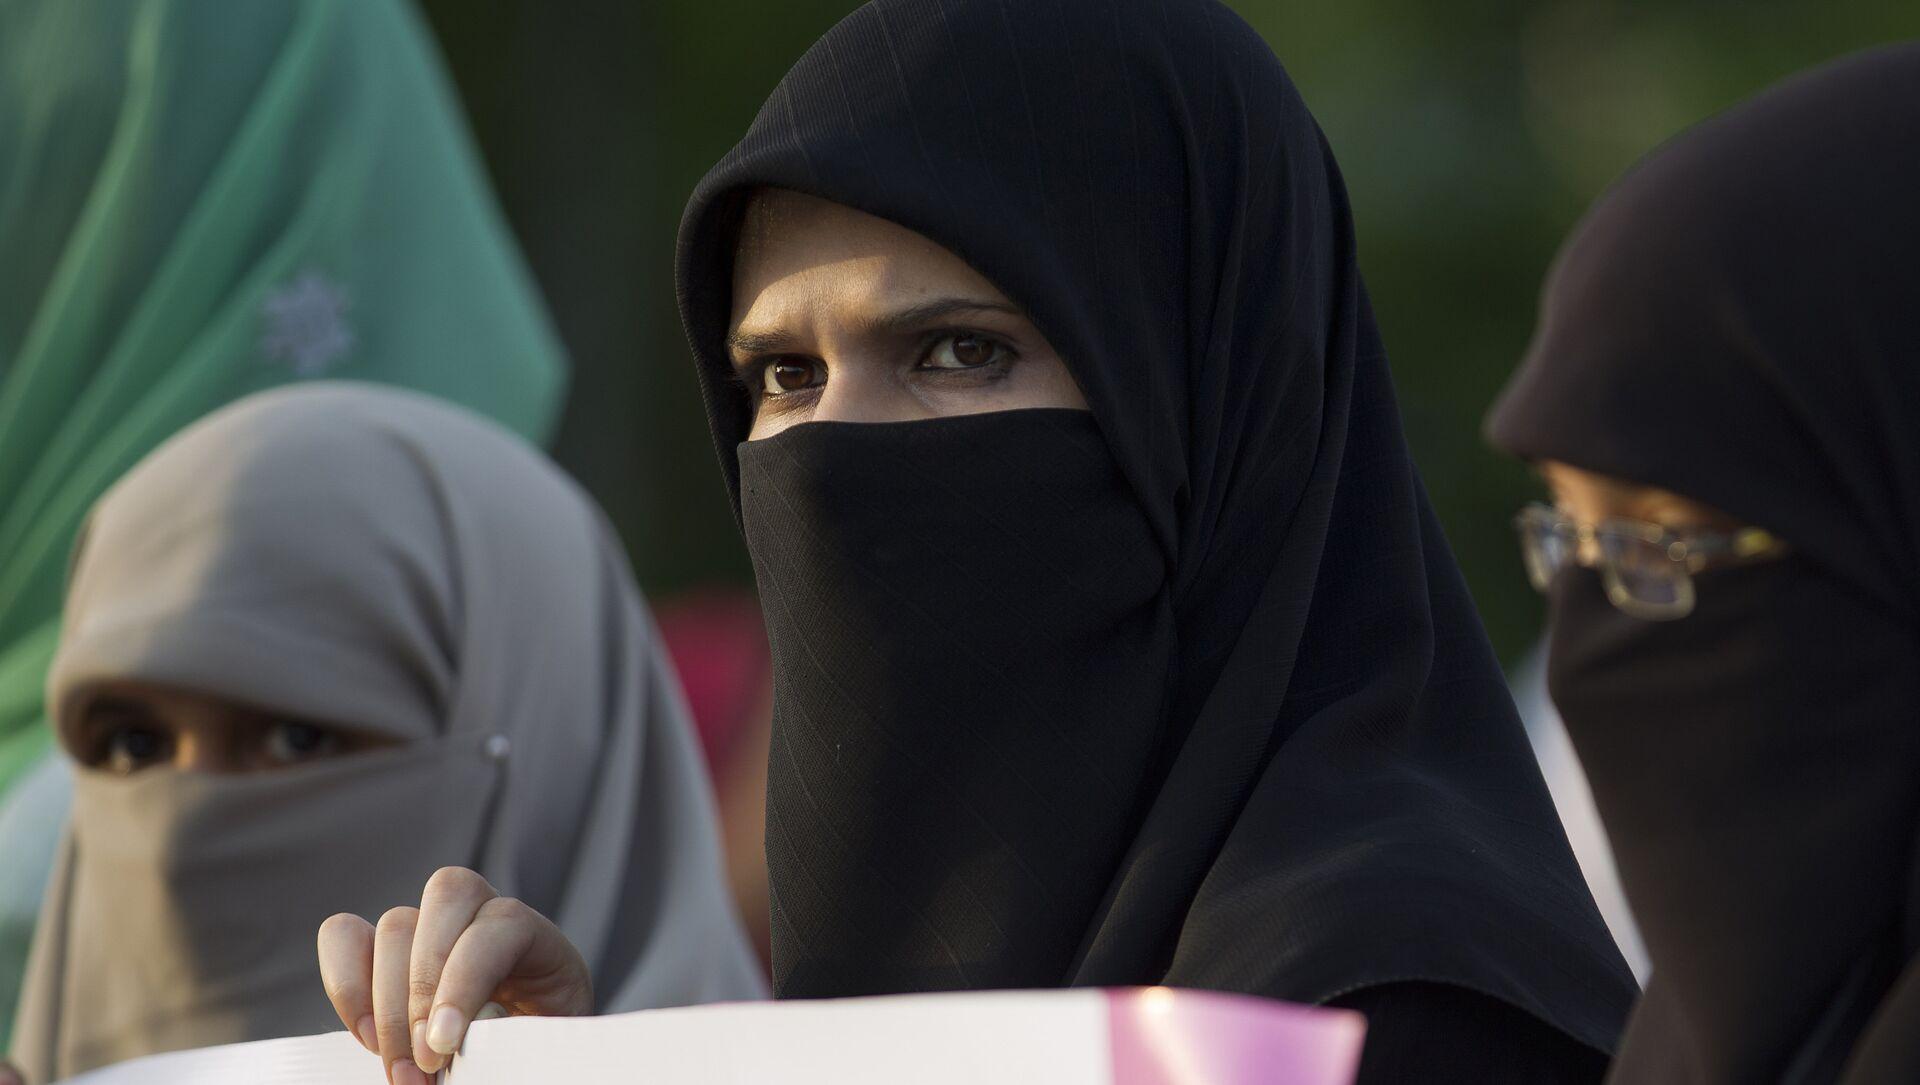 Muslim women. (File) - Sputnik International, 1920, 30.07.2021